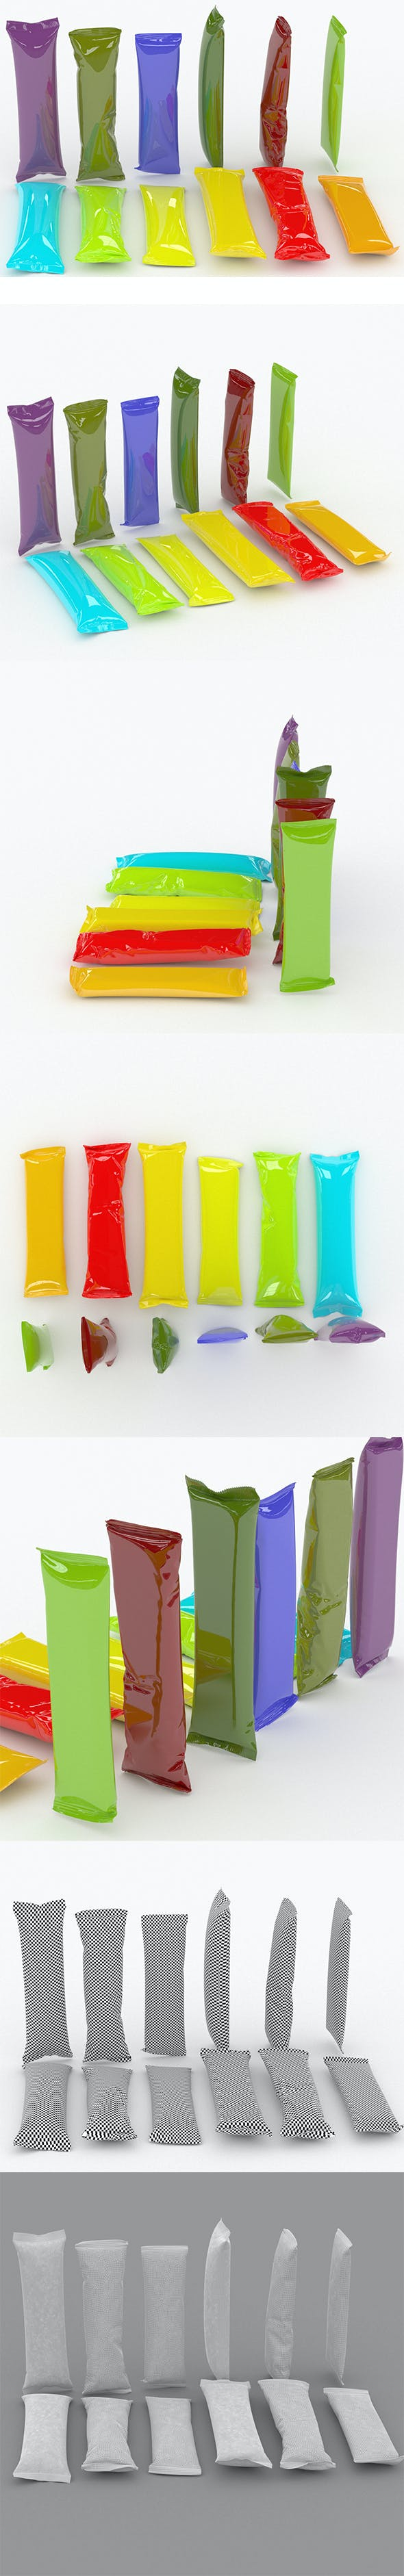 Collection Food packaging v9 - 3DOcean Item for Sale